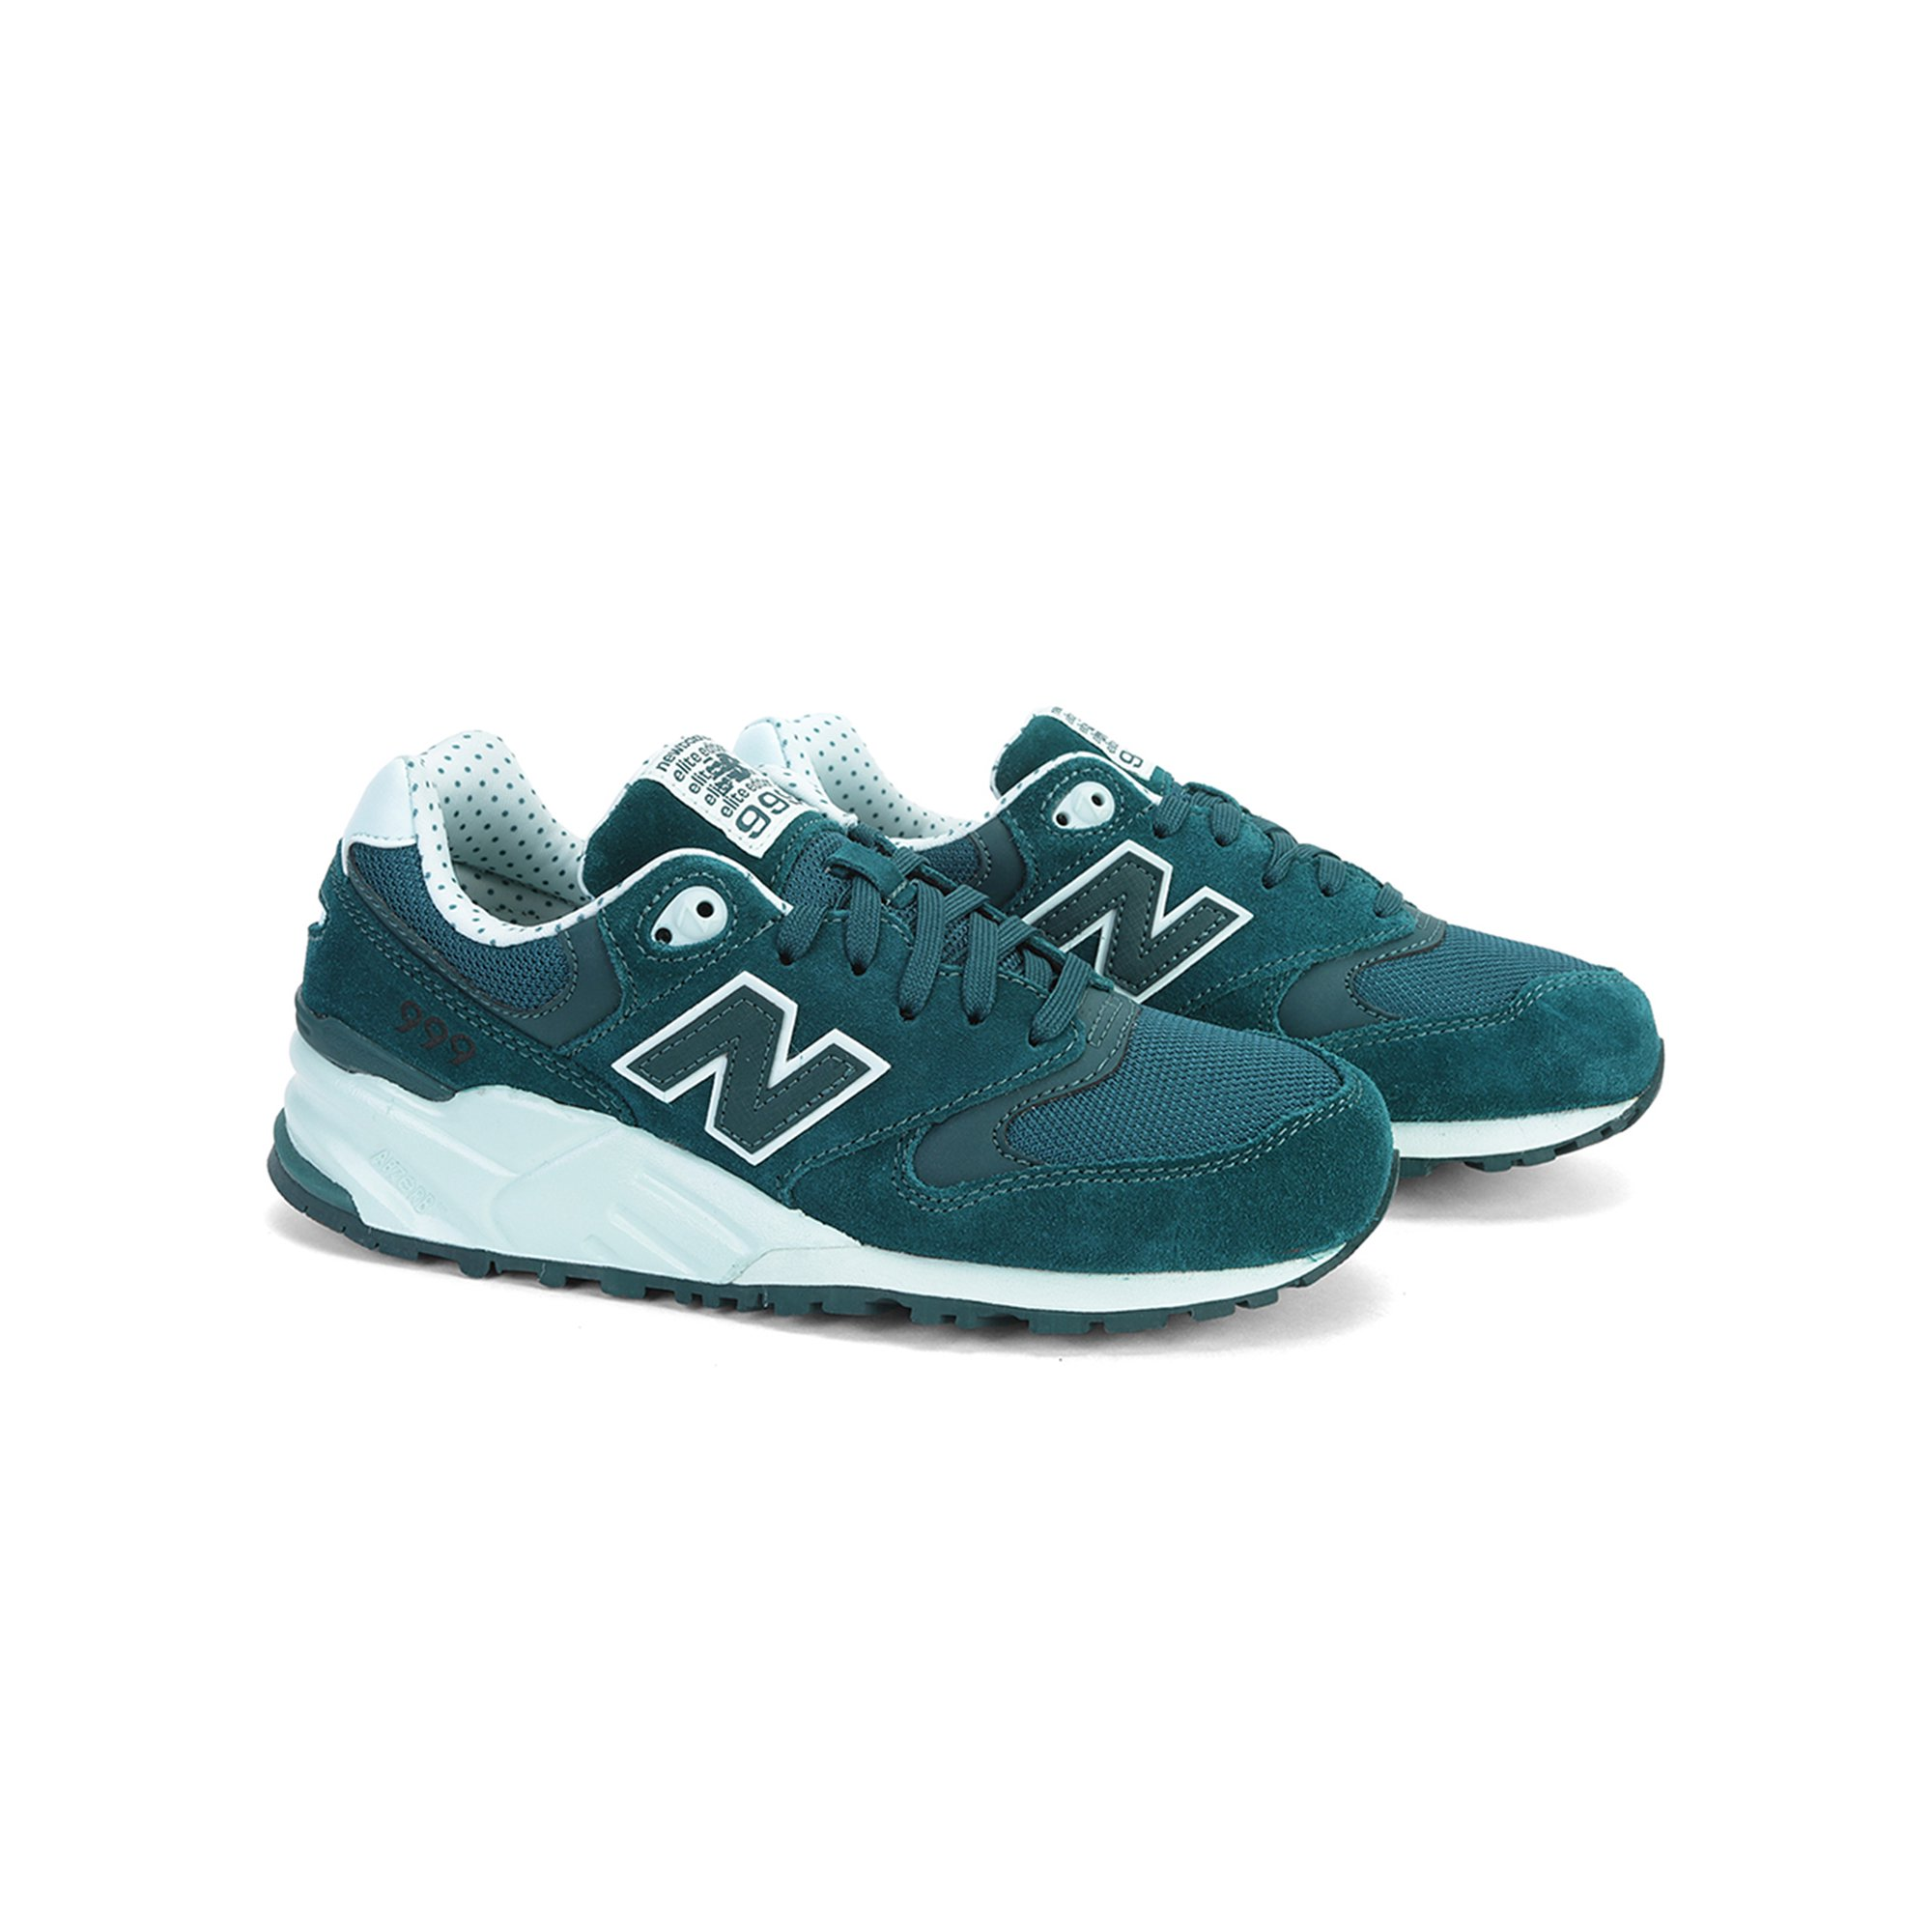 66b1ee4efc084 Buy New Balance Women's 999 Shadows Sneakers WL999AB Wintergreen ...